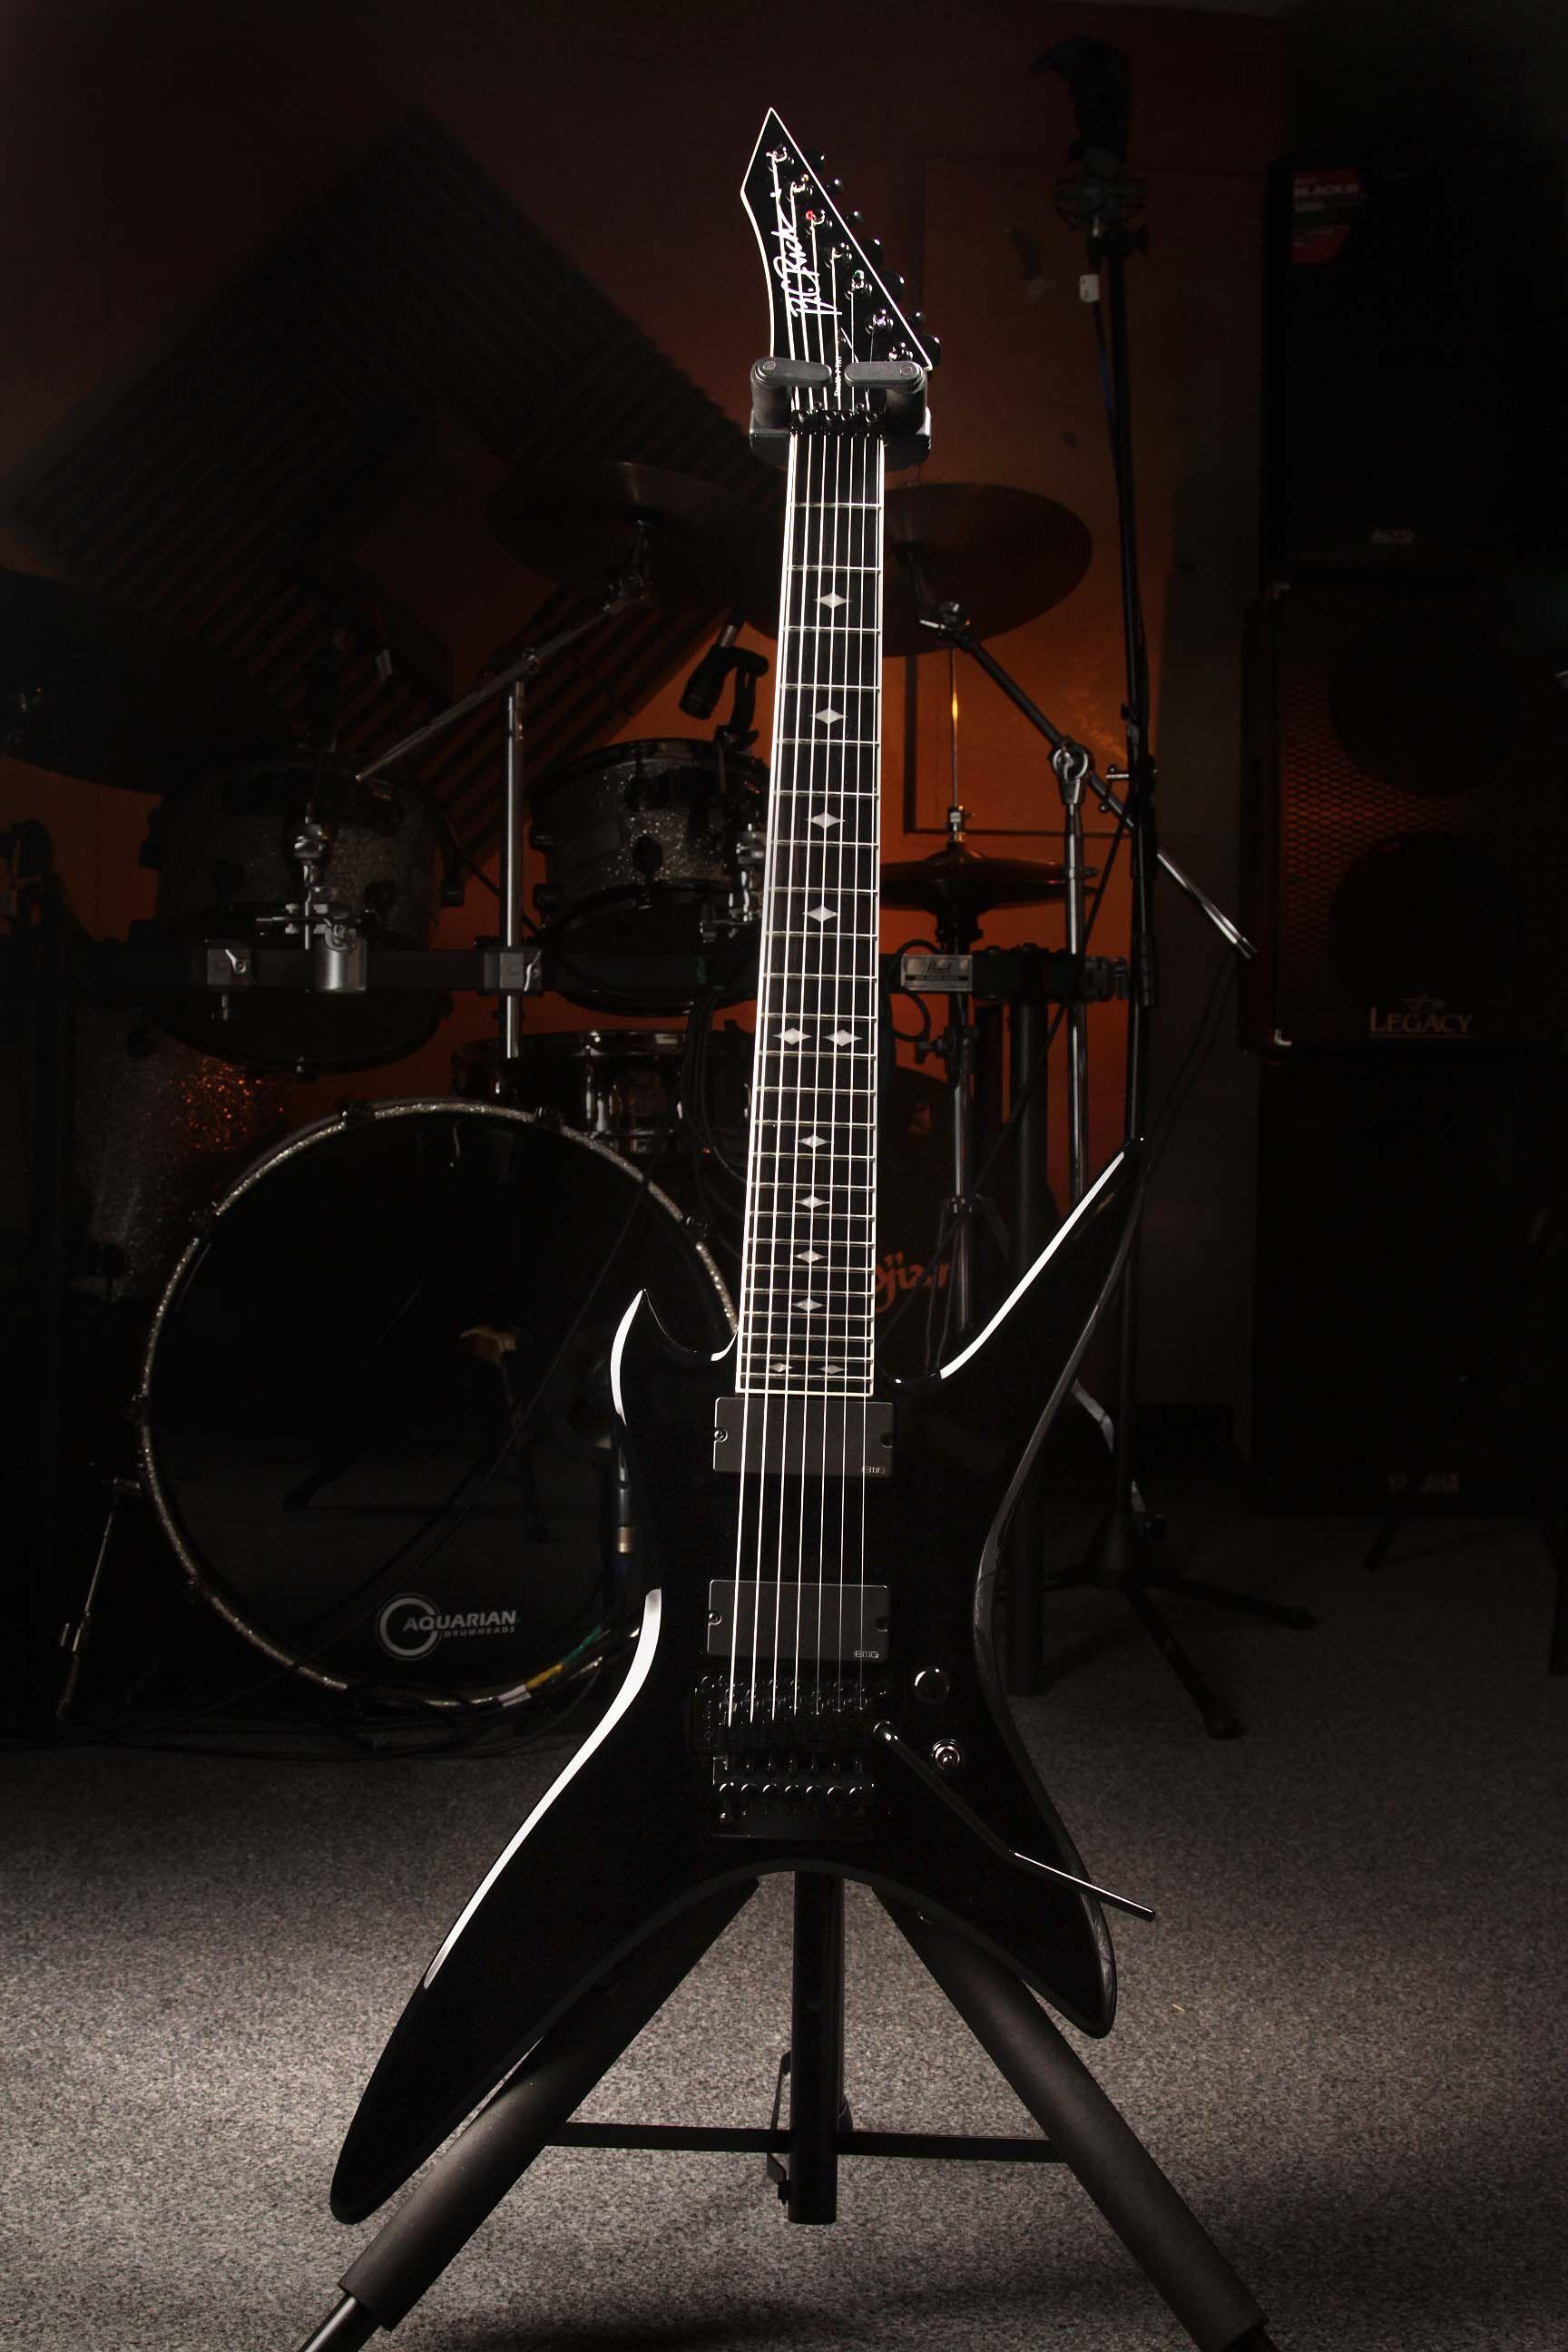 11 Ideas De B C Rich Guitarras Guitarra Electrica Guitarras Personalizadas